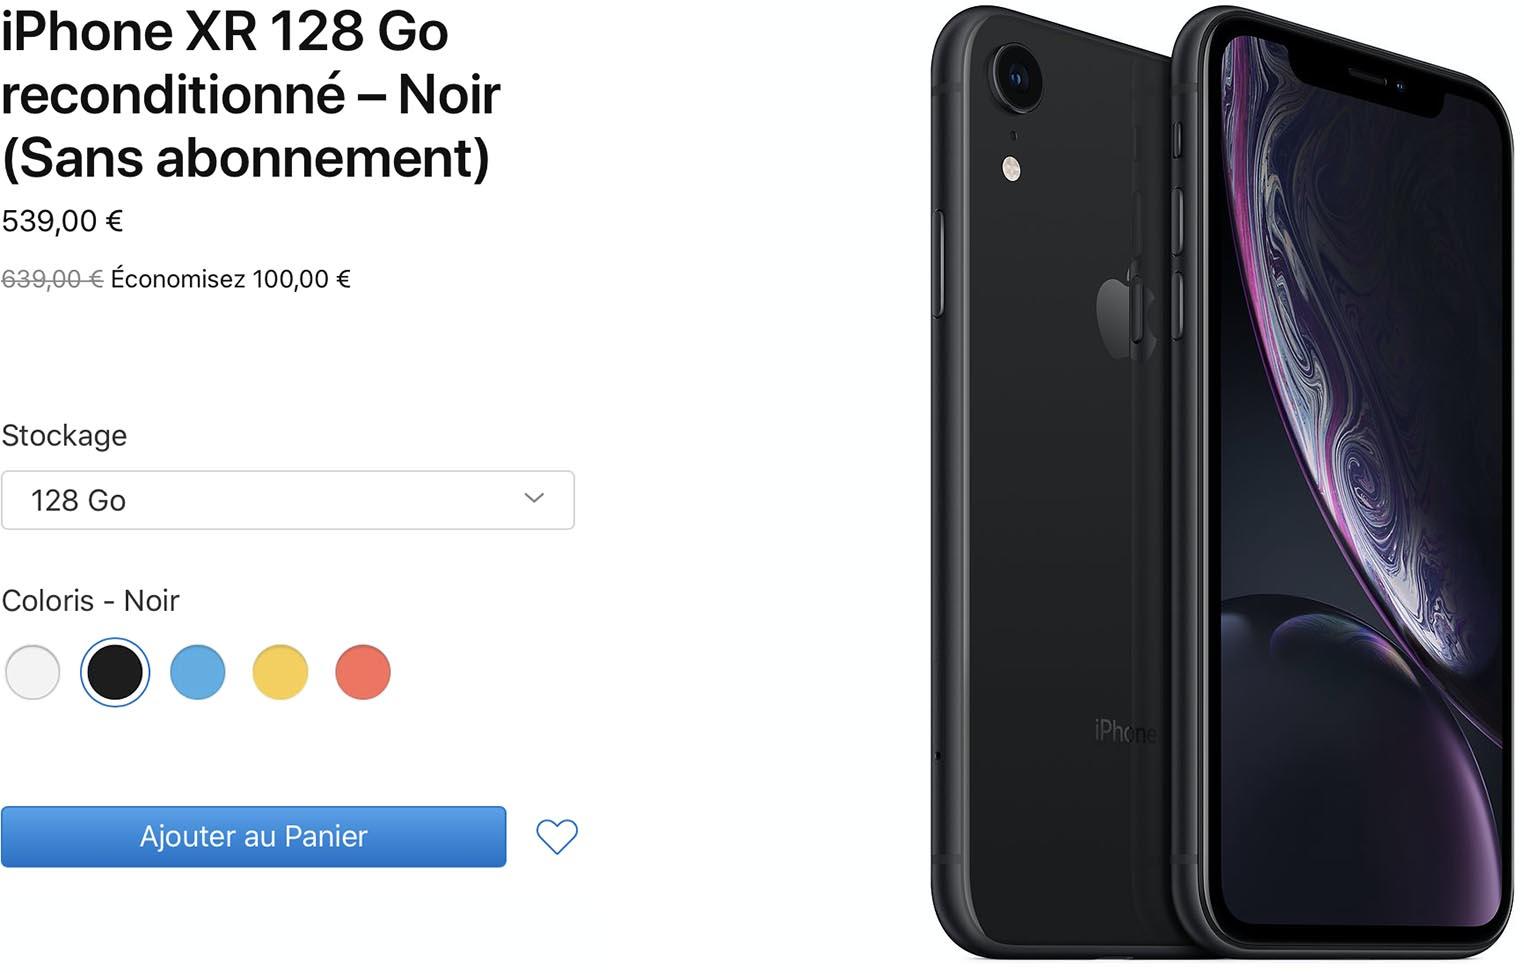 iPhone XR Refurb Store